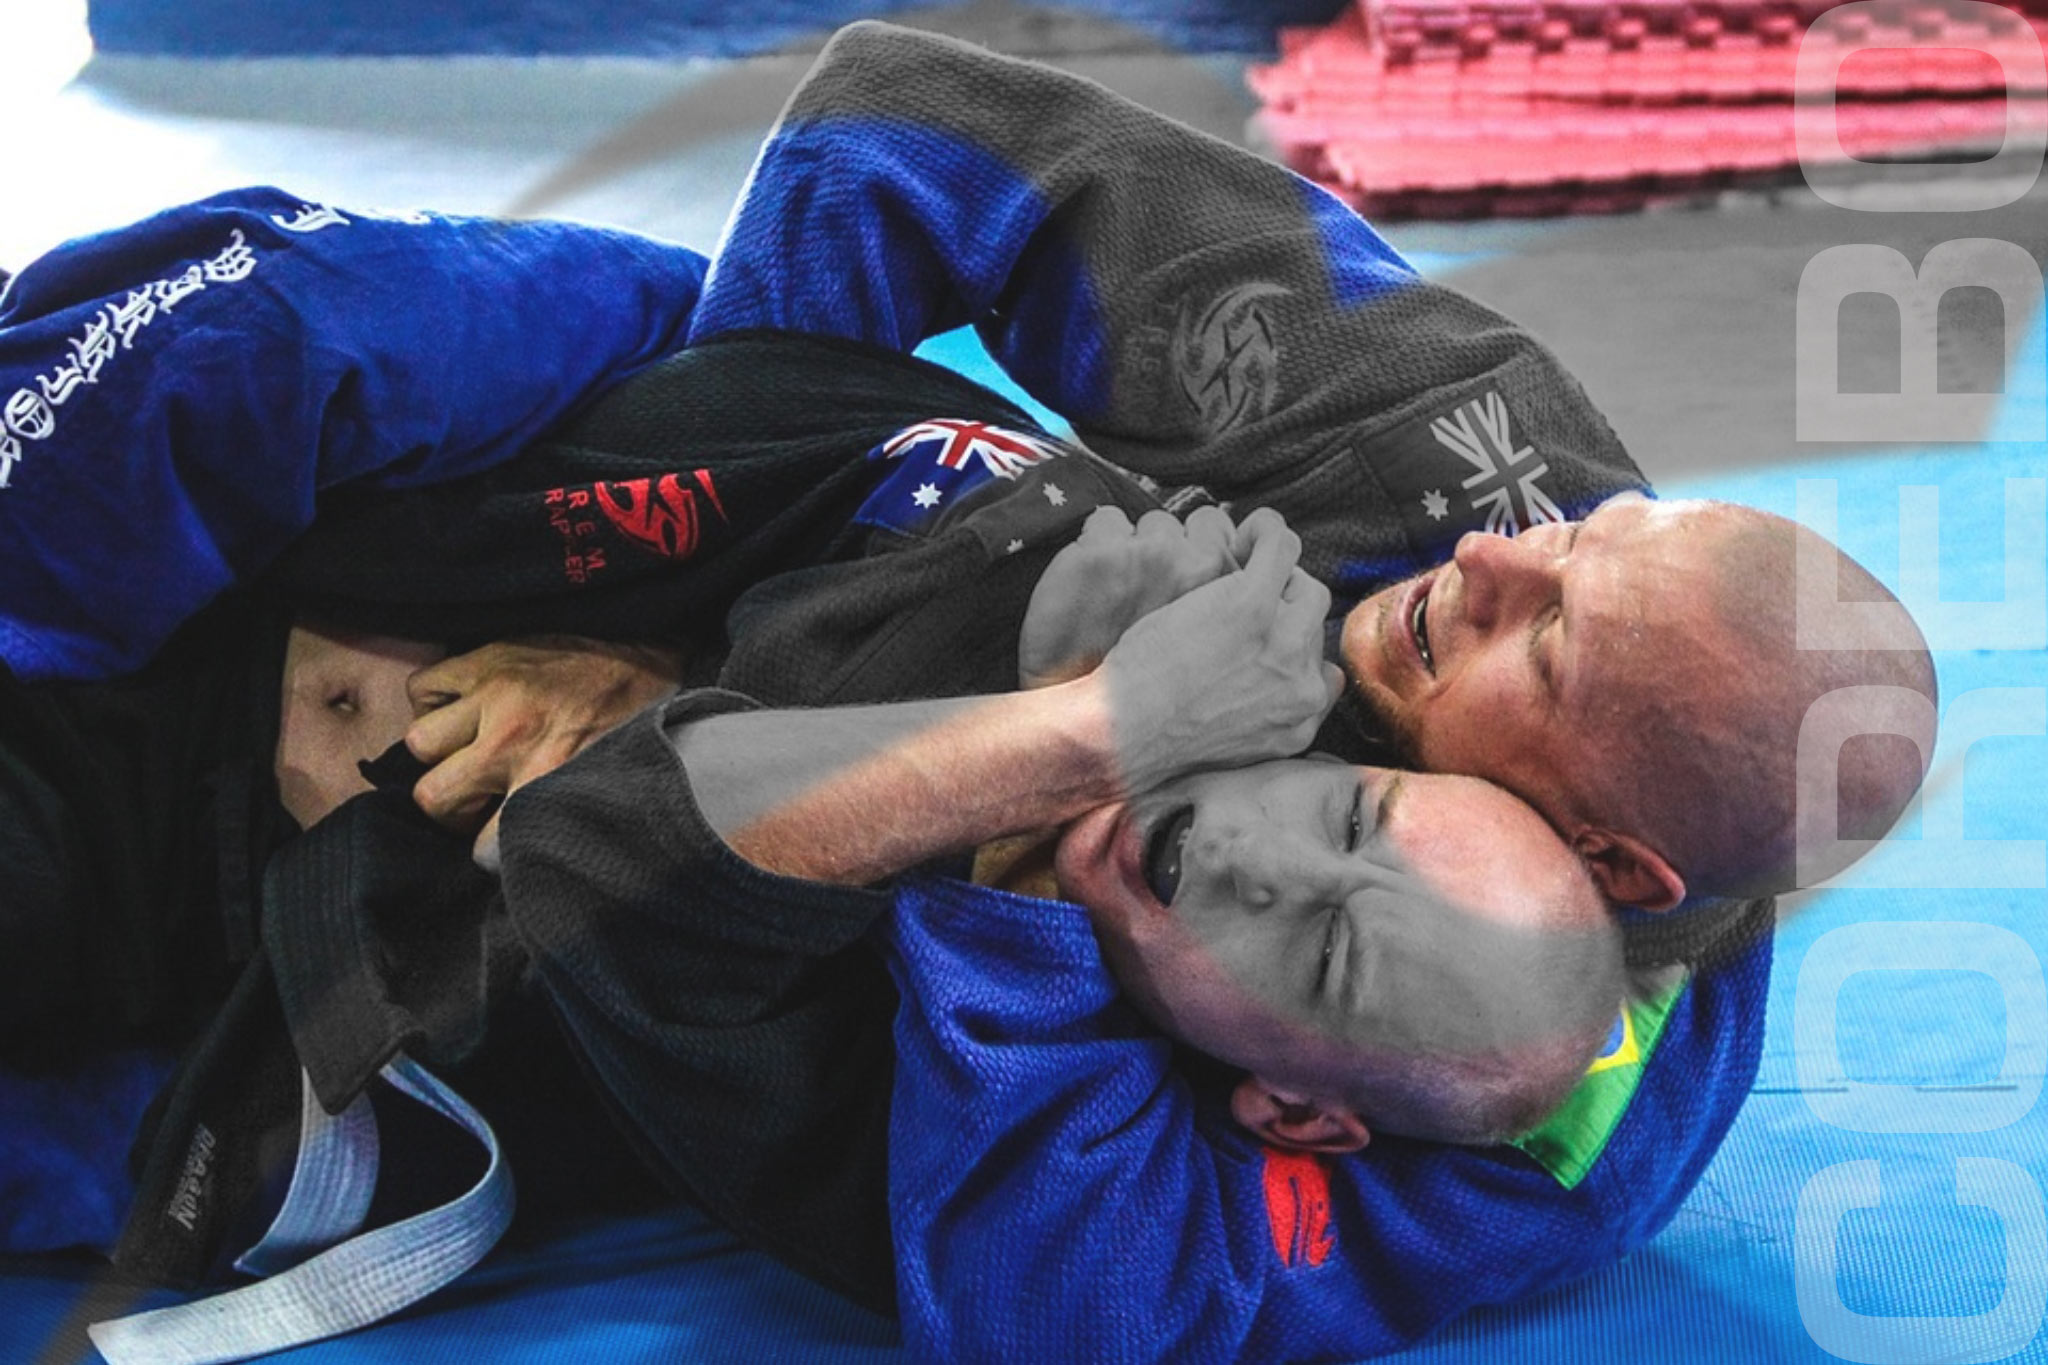 Corso di Nutrizione nel Brasilian Jiu Jitsu